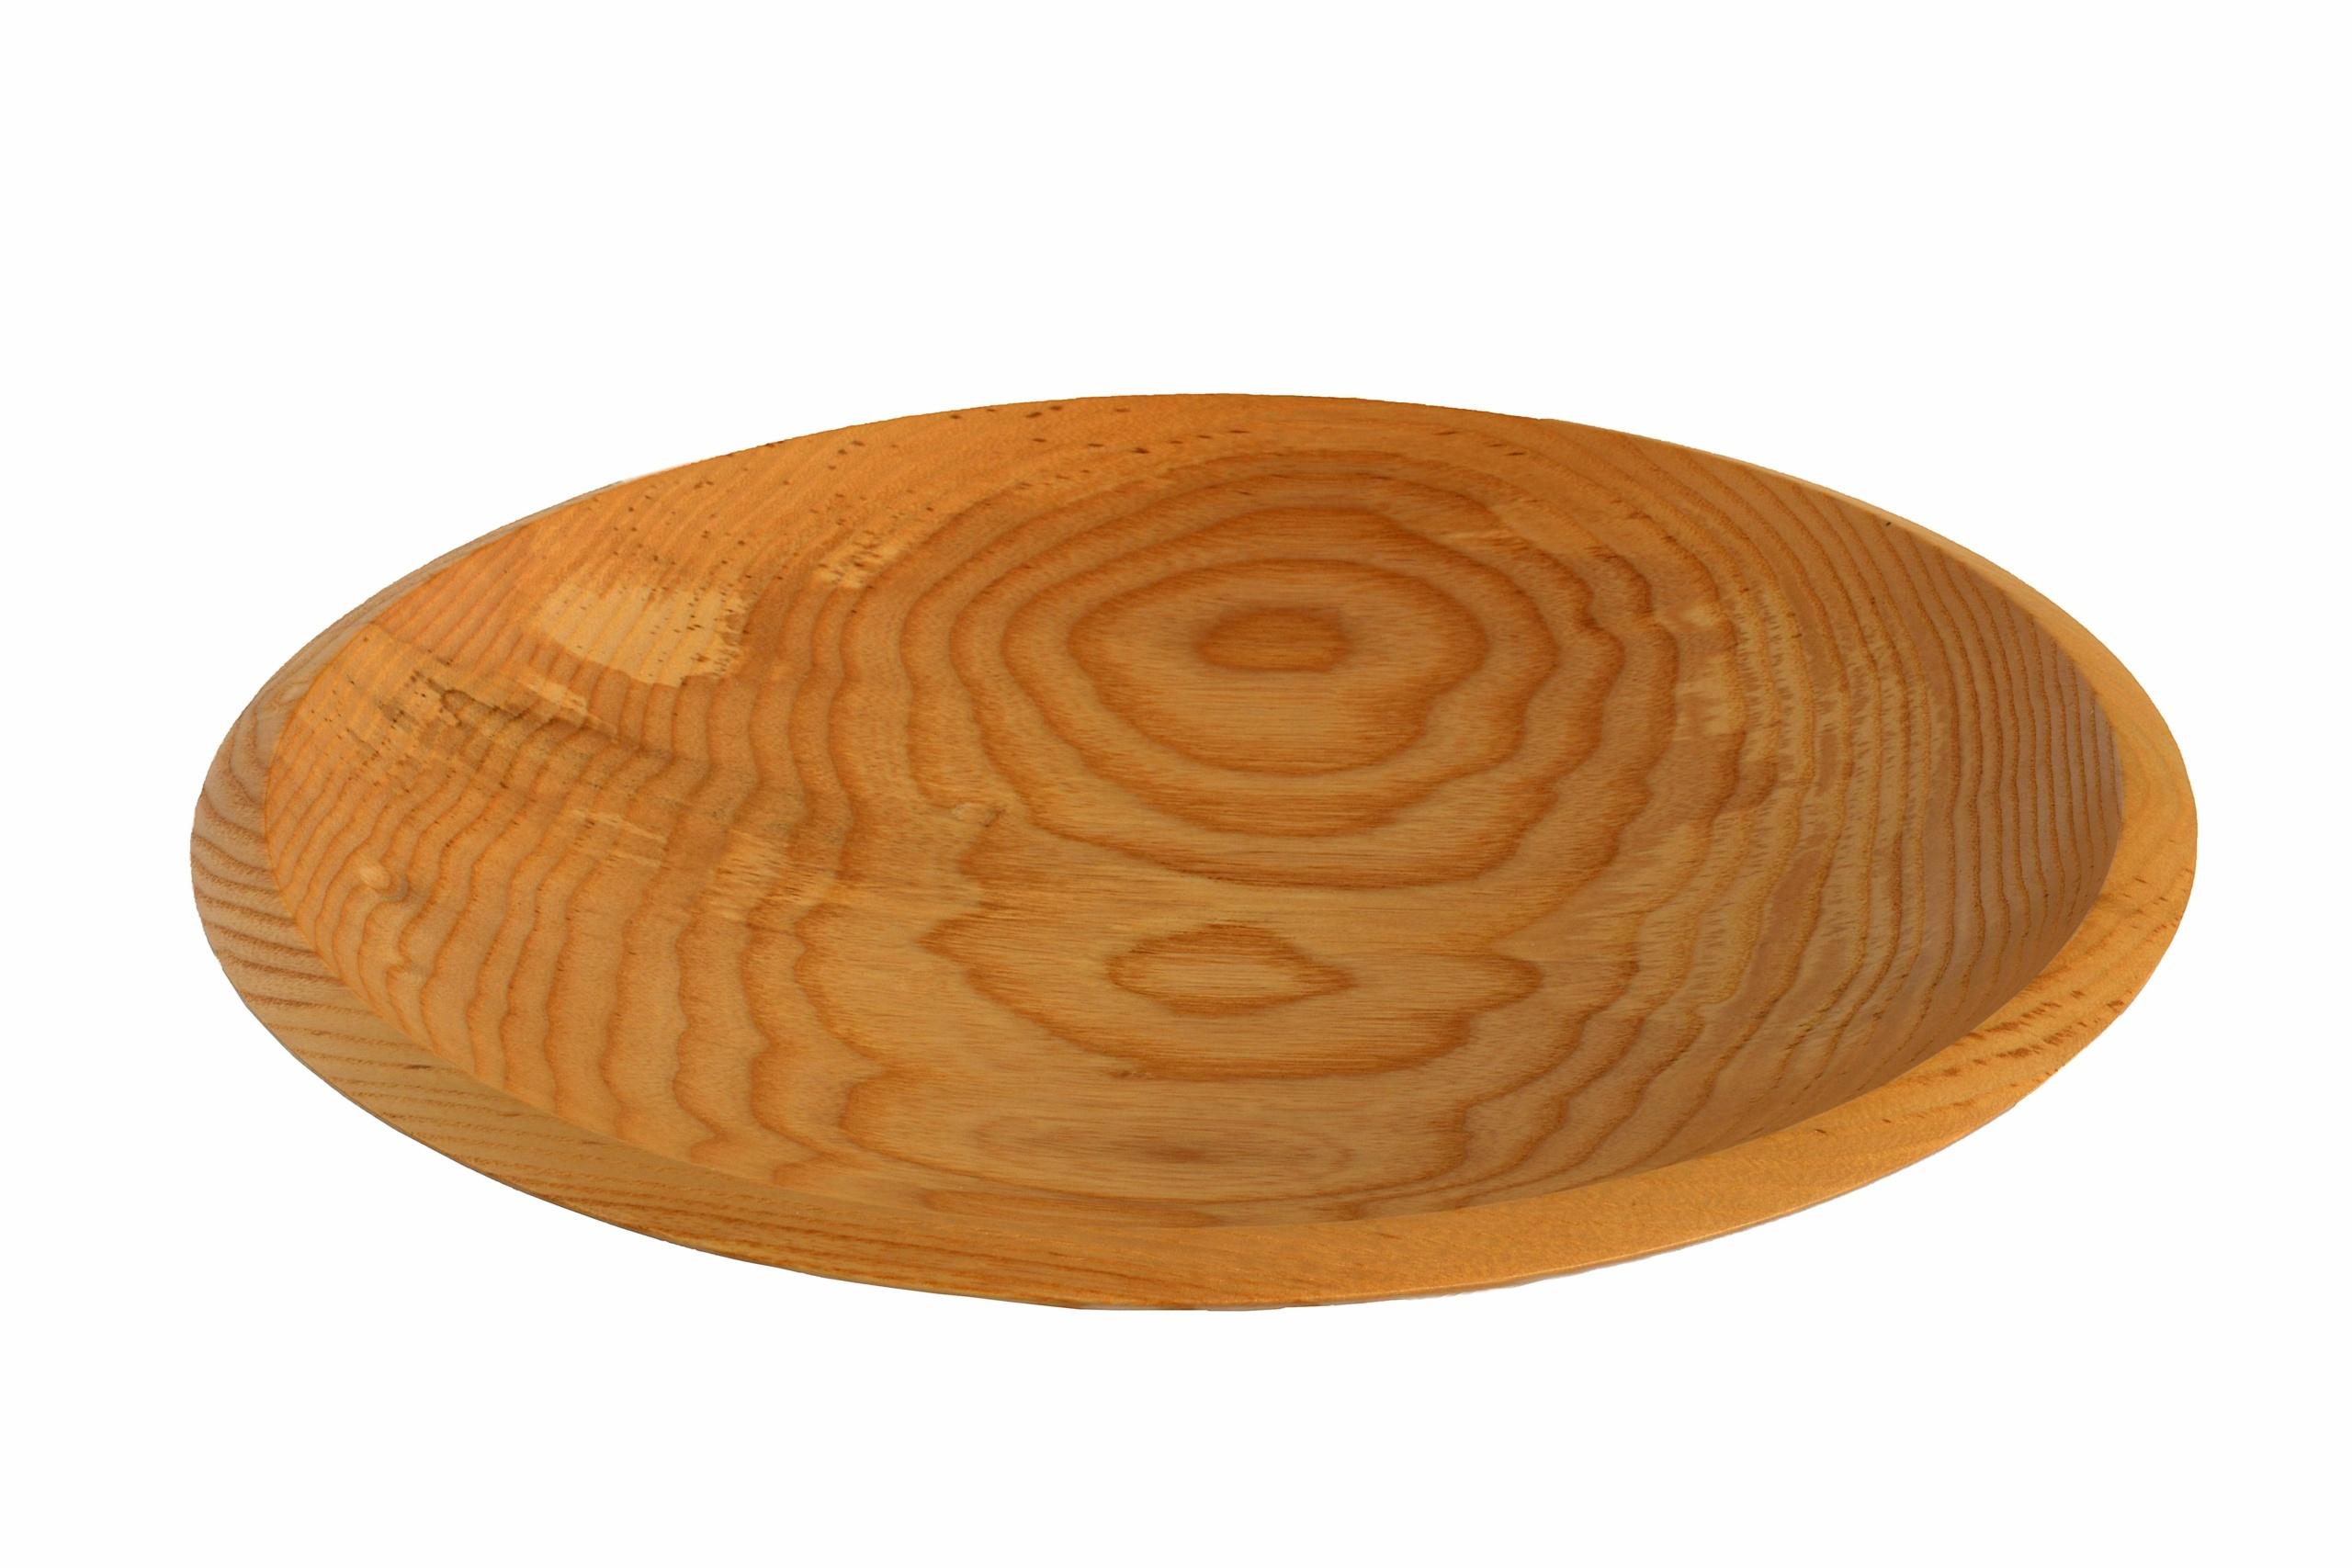 ash wood turned bowl